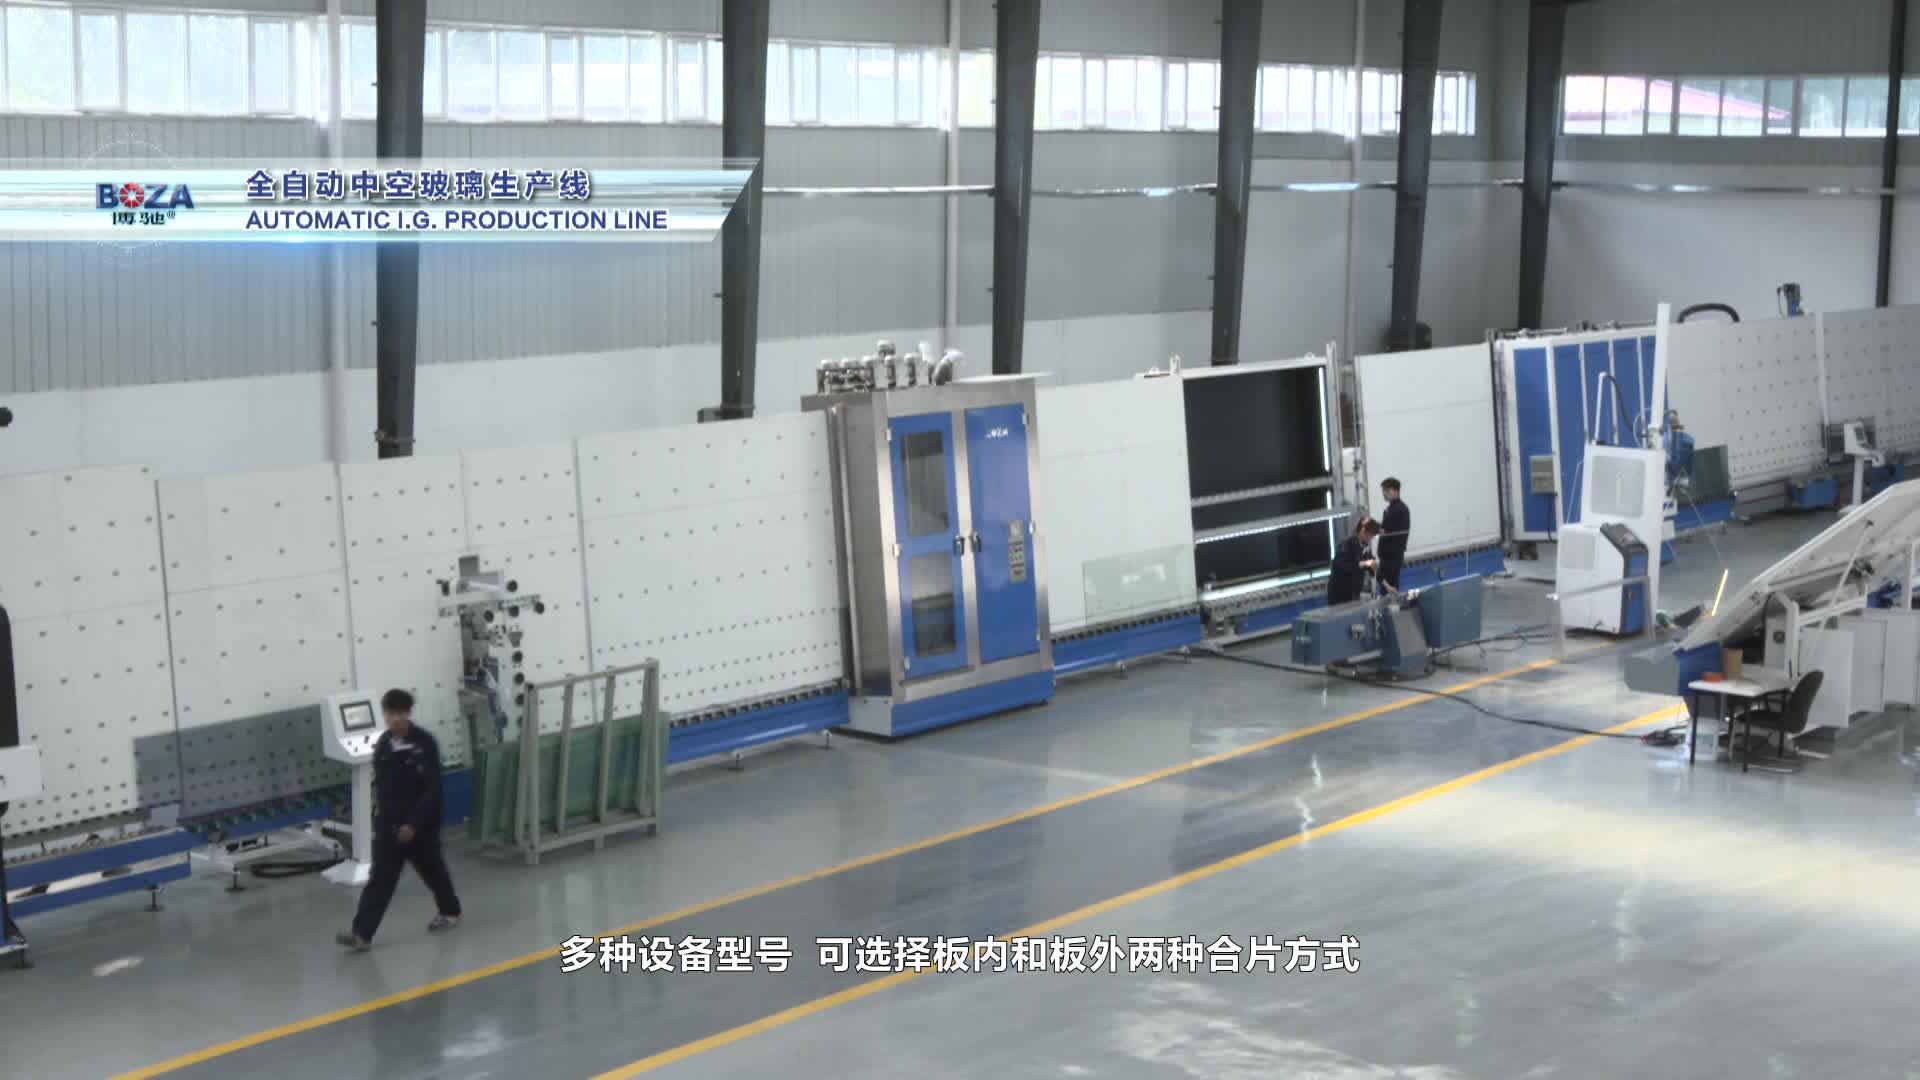 IGL-H Otomatik Isıcam Üretim Hattı